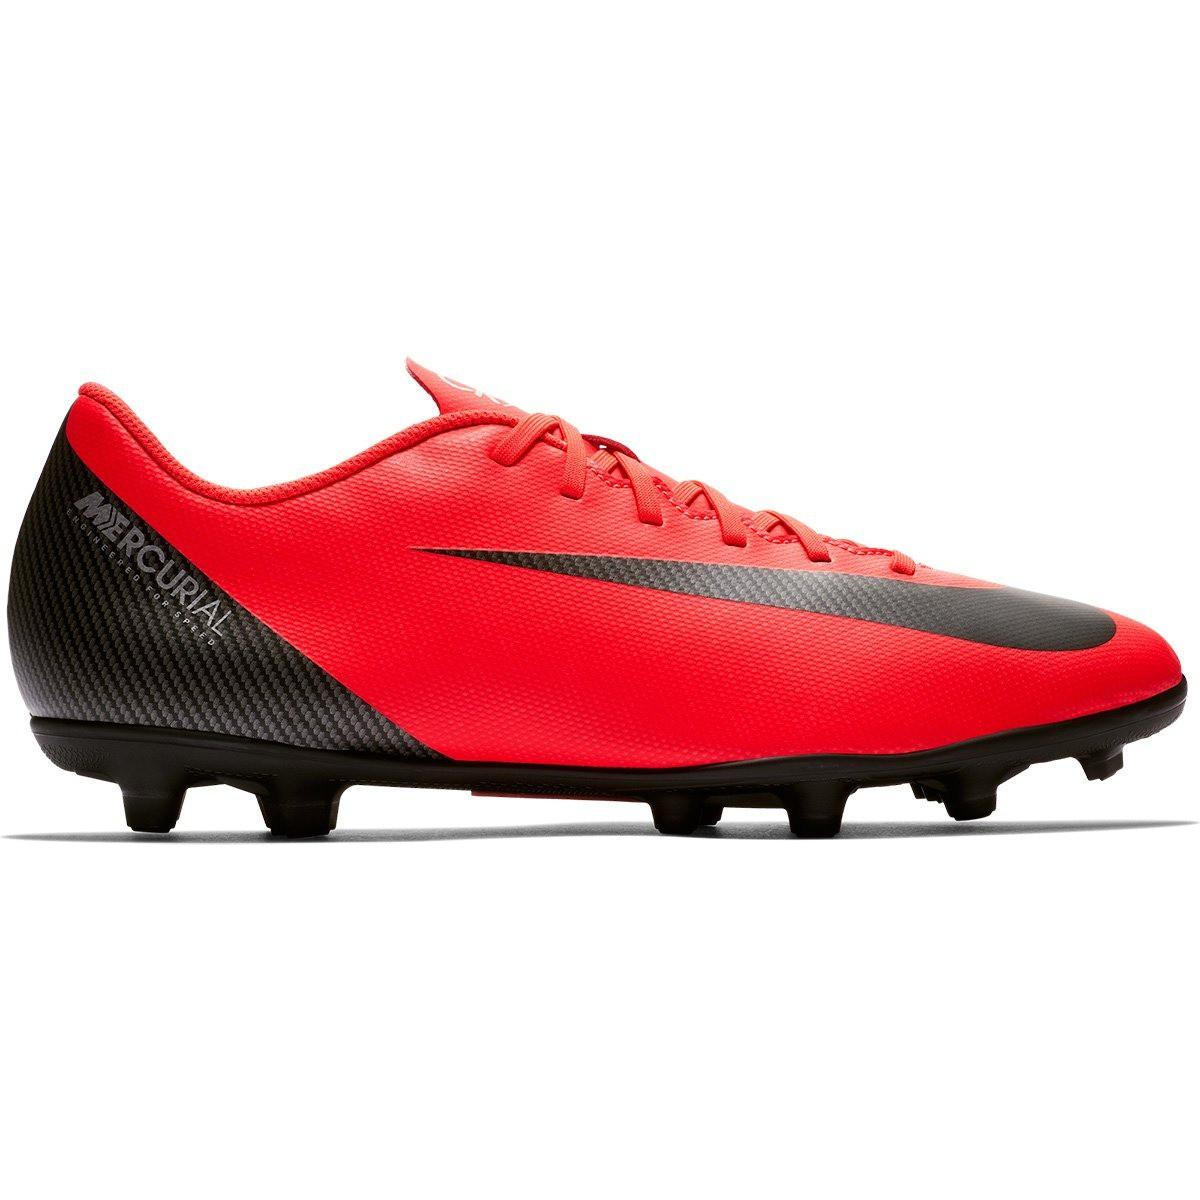 Chuteira Nike Vapor 12 Club Cr7 FG MG